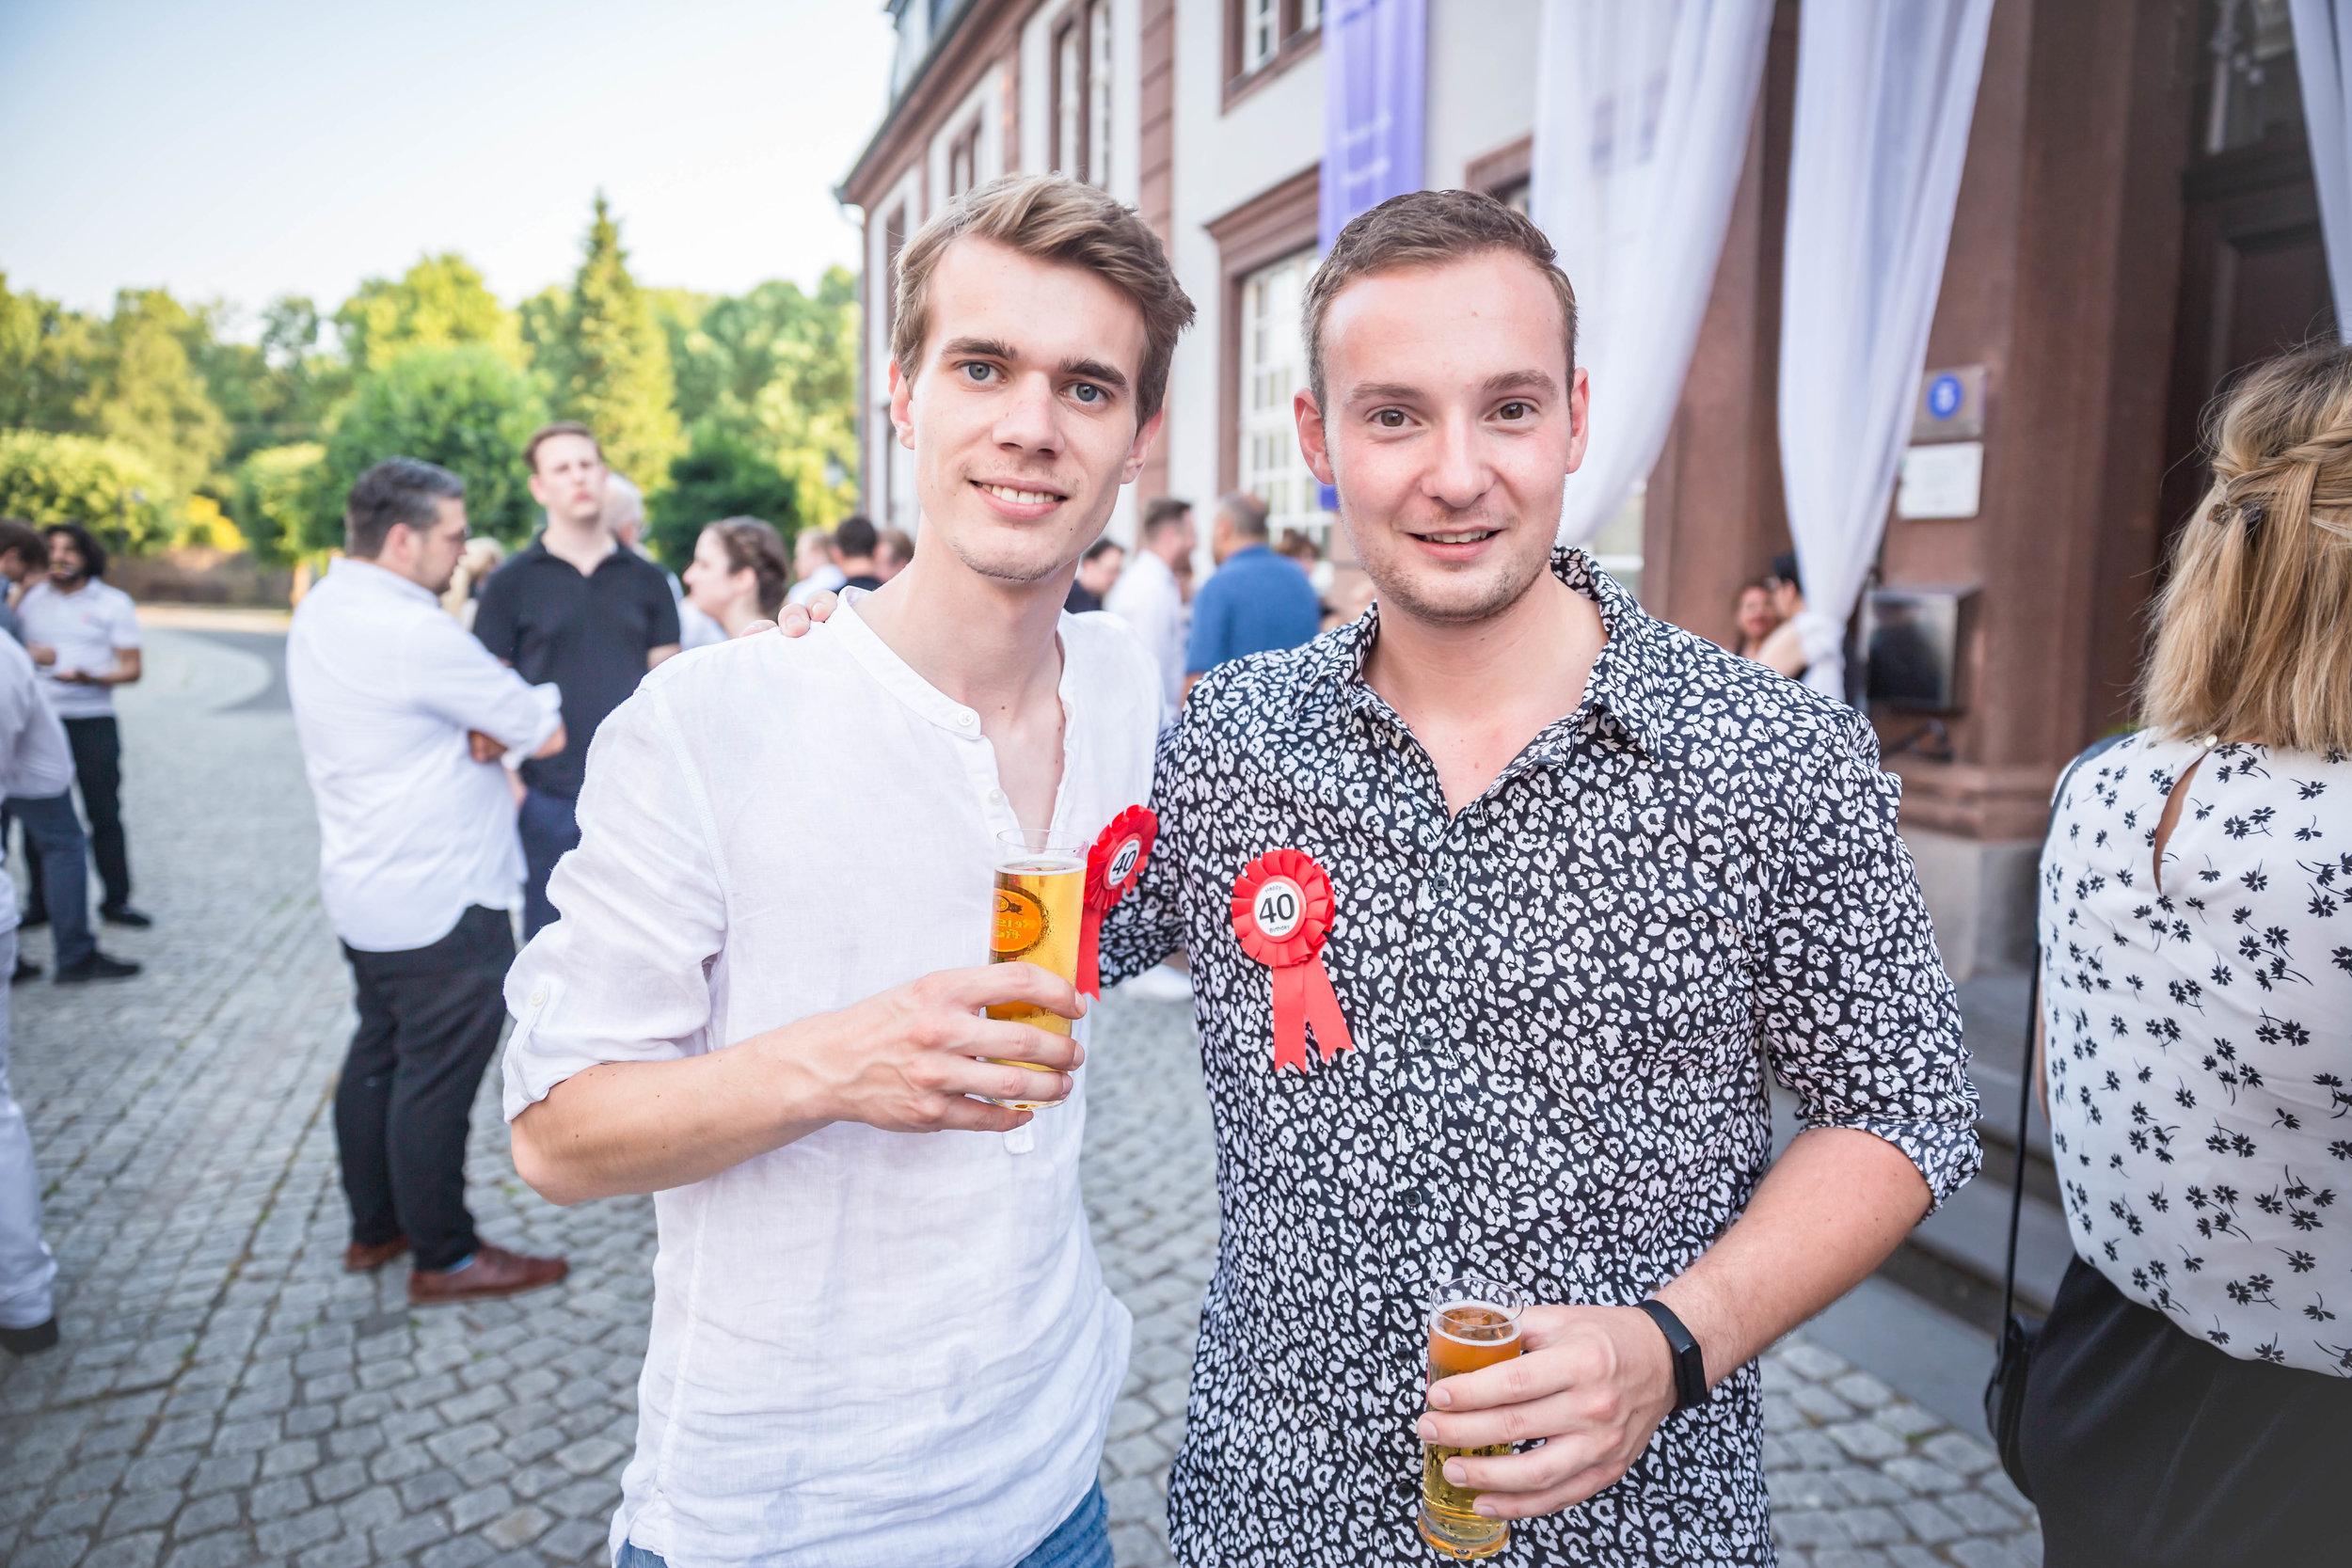 20190626_Akademie_40-jähriges_Jubiläum_FB_kl-5311855.jpg